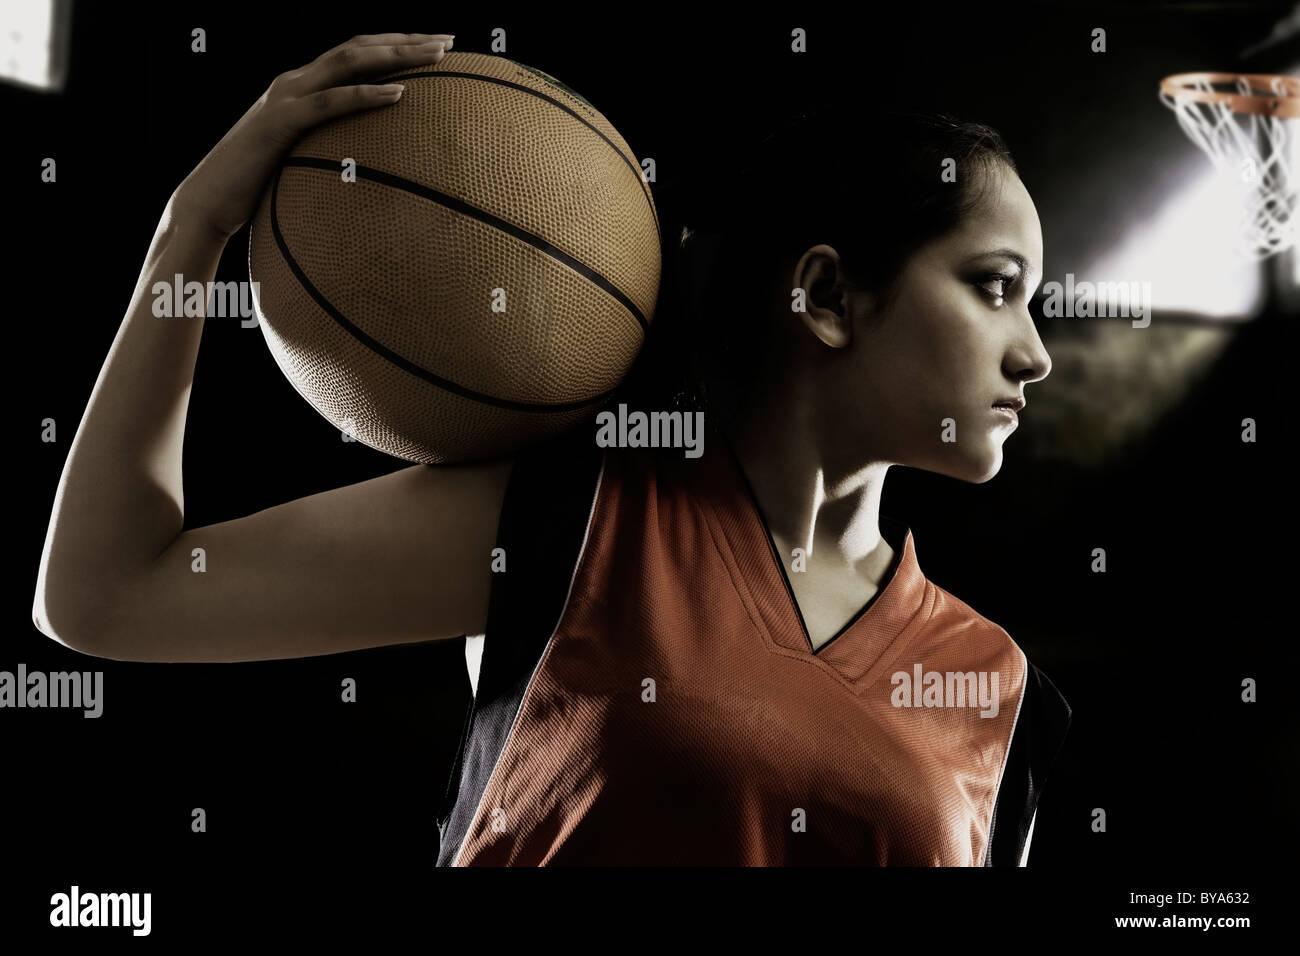 Jeune fille avec un terrain de basket-ball Photo Stock